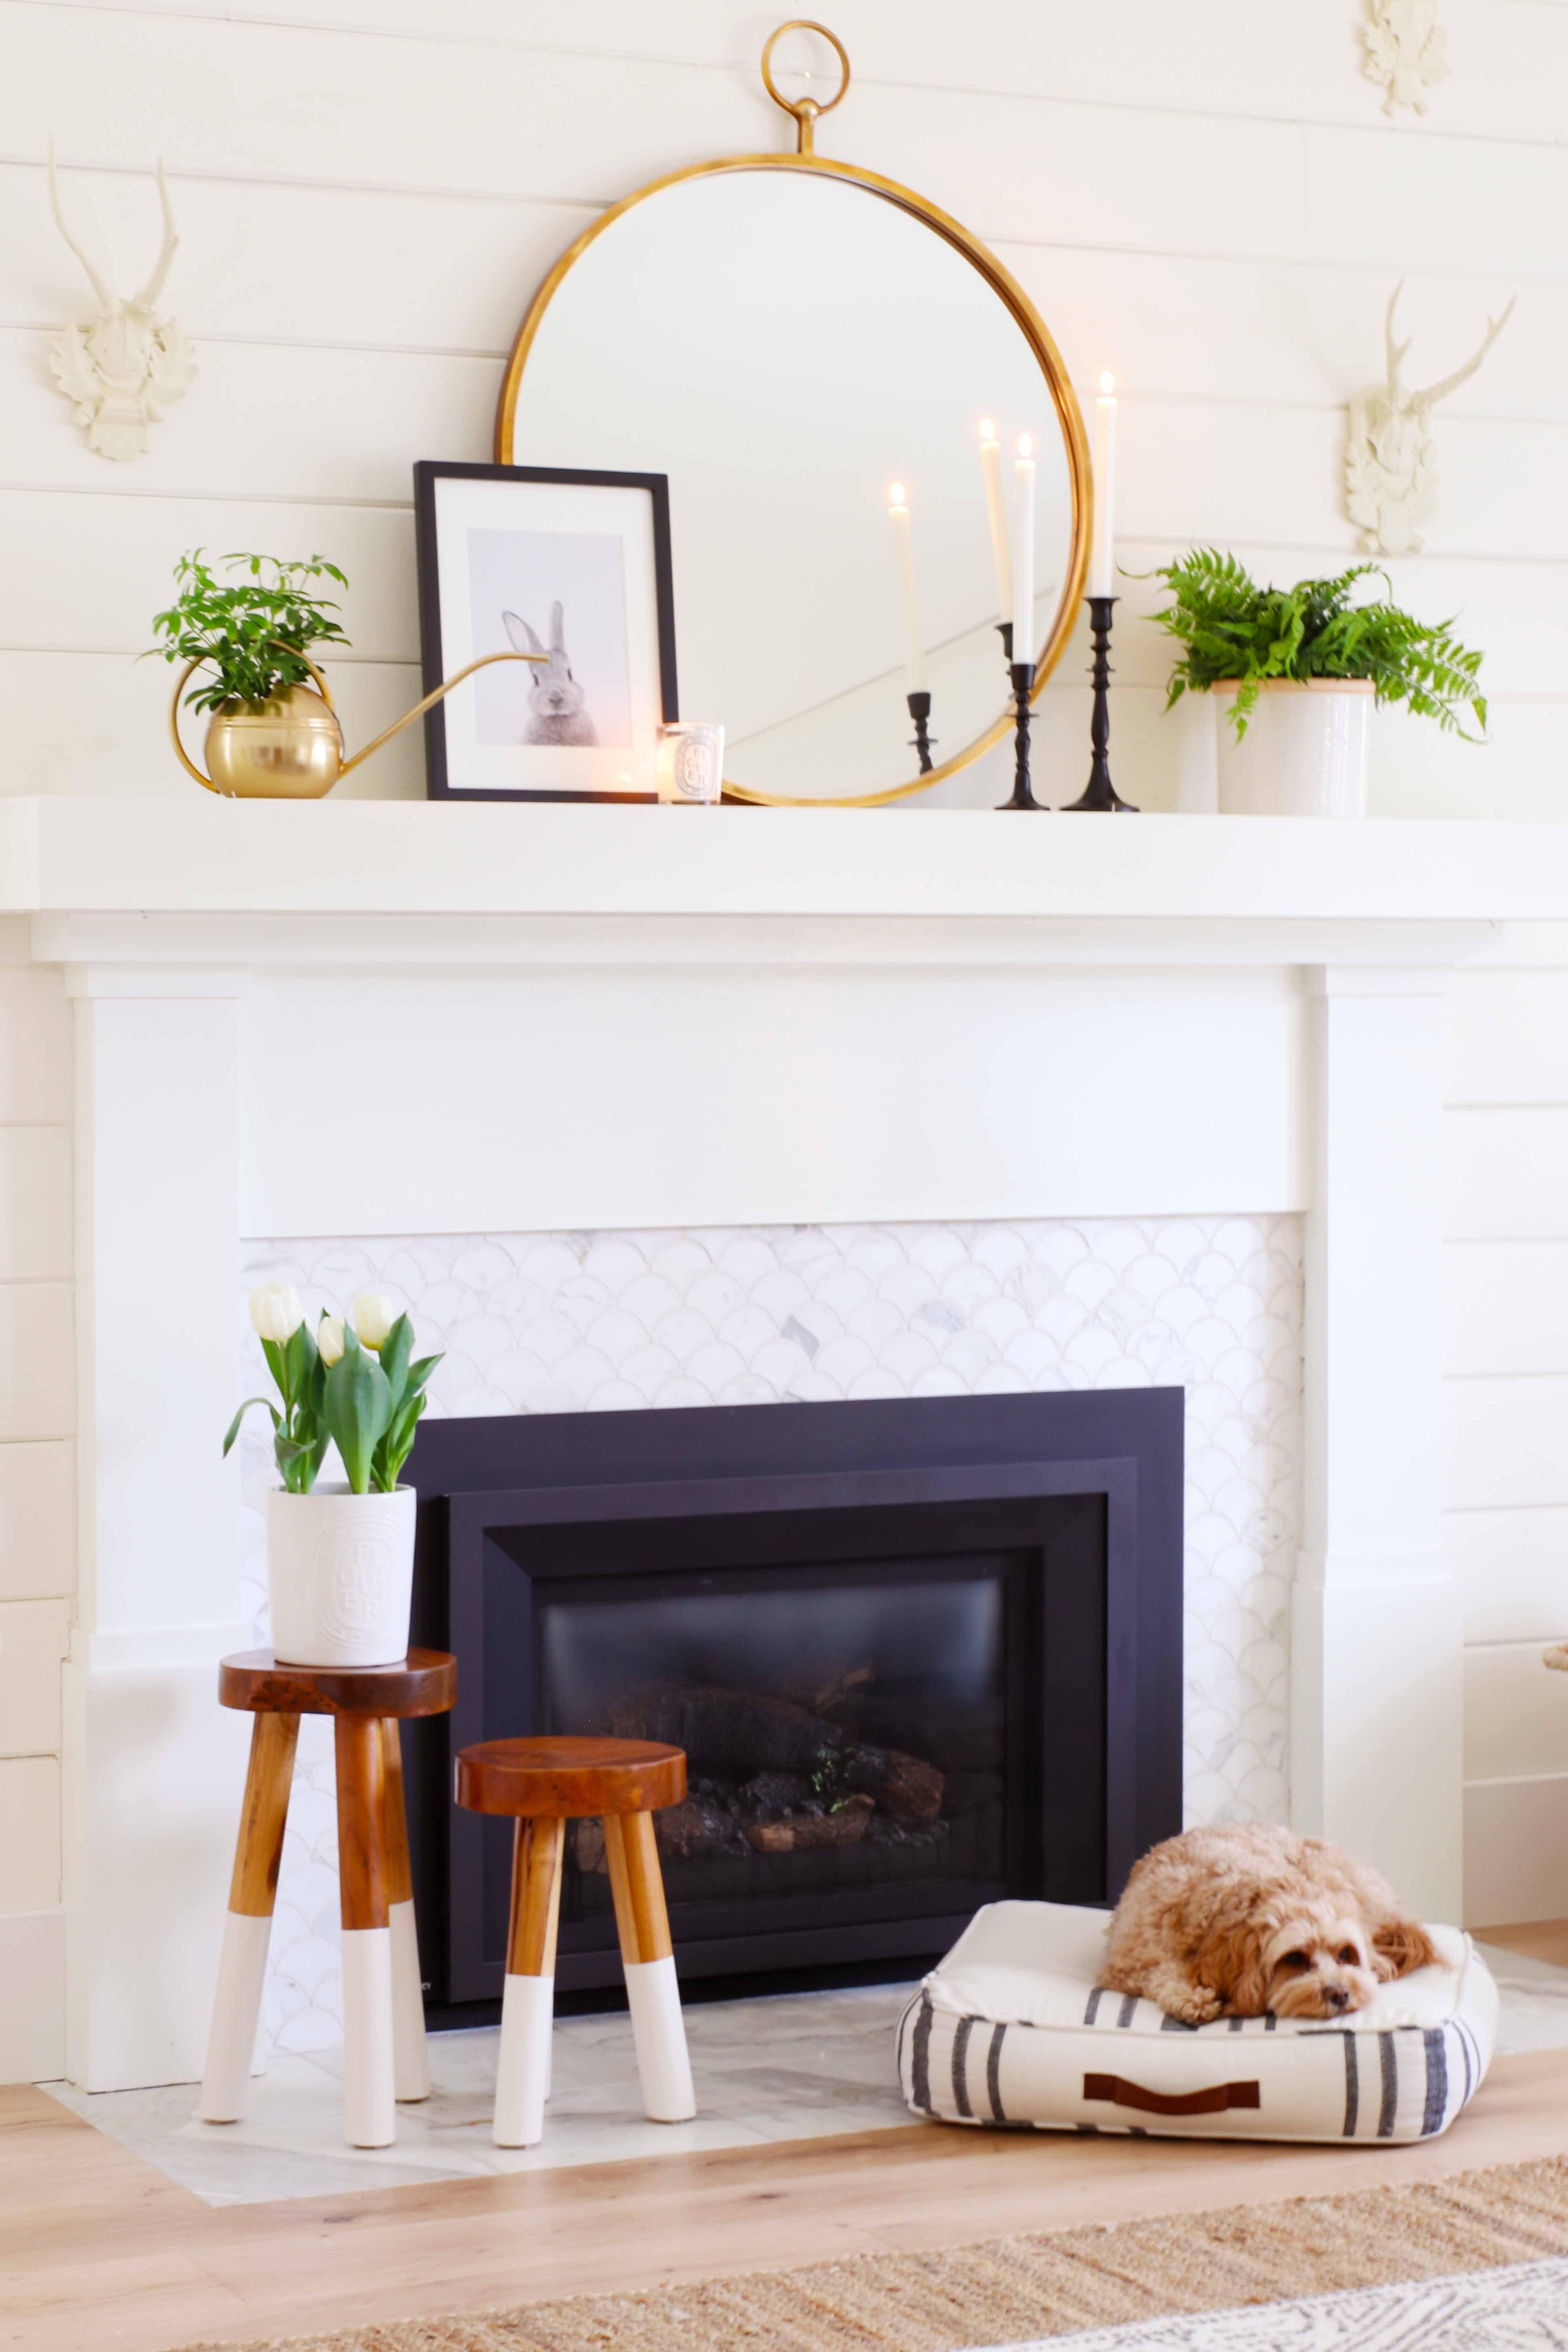 Boho Farmhouse Spring Decorating Ideas Fireplace Mantle Decor Simple Fireplace Simple Mantel Decor